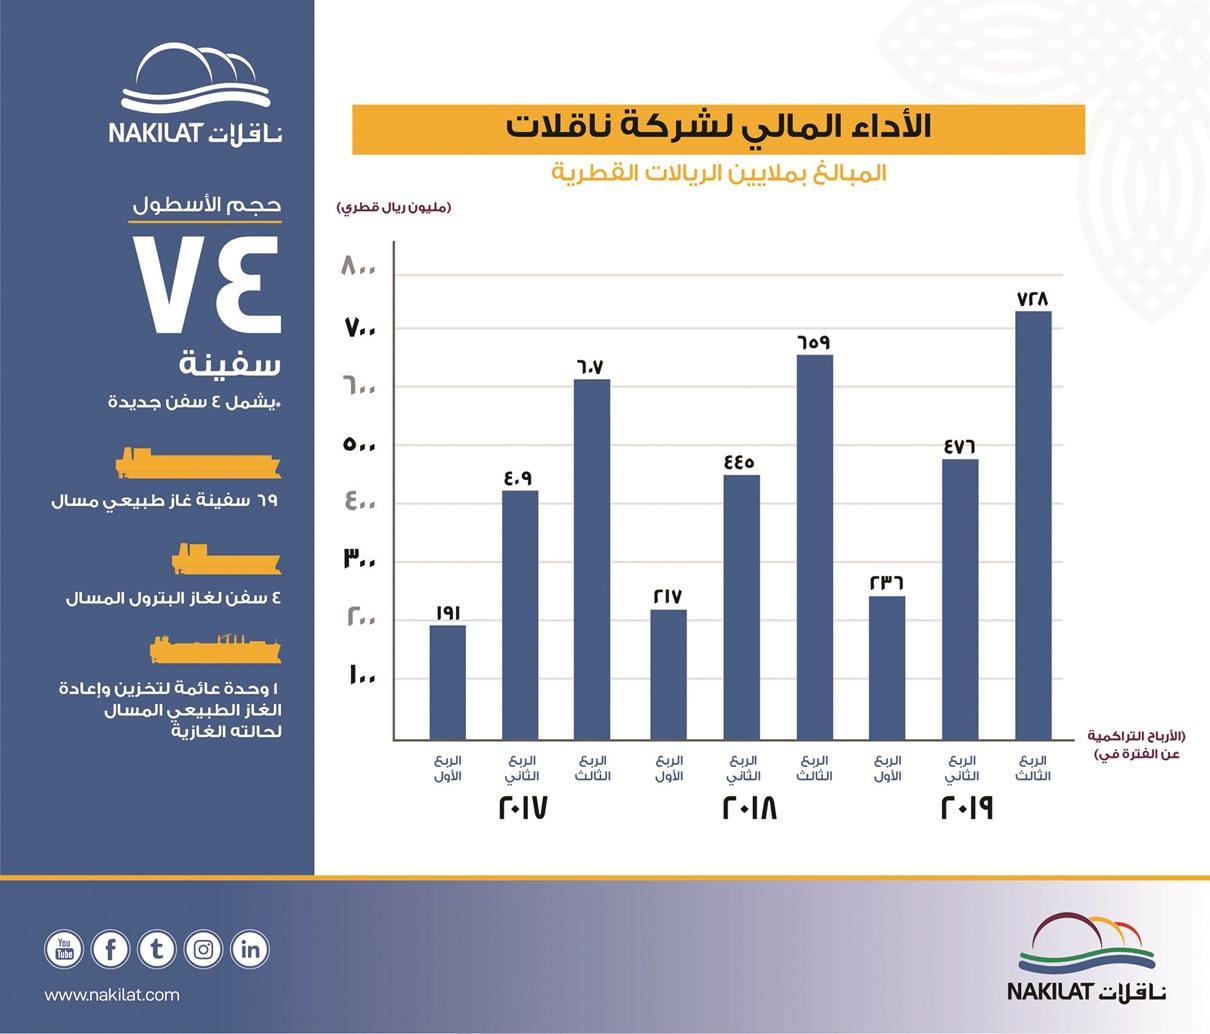 728 million riyals Nakilat profits in 9 months